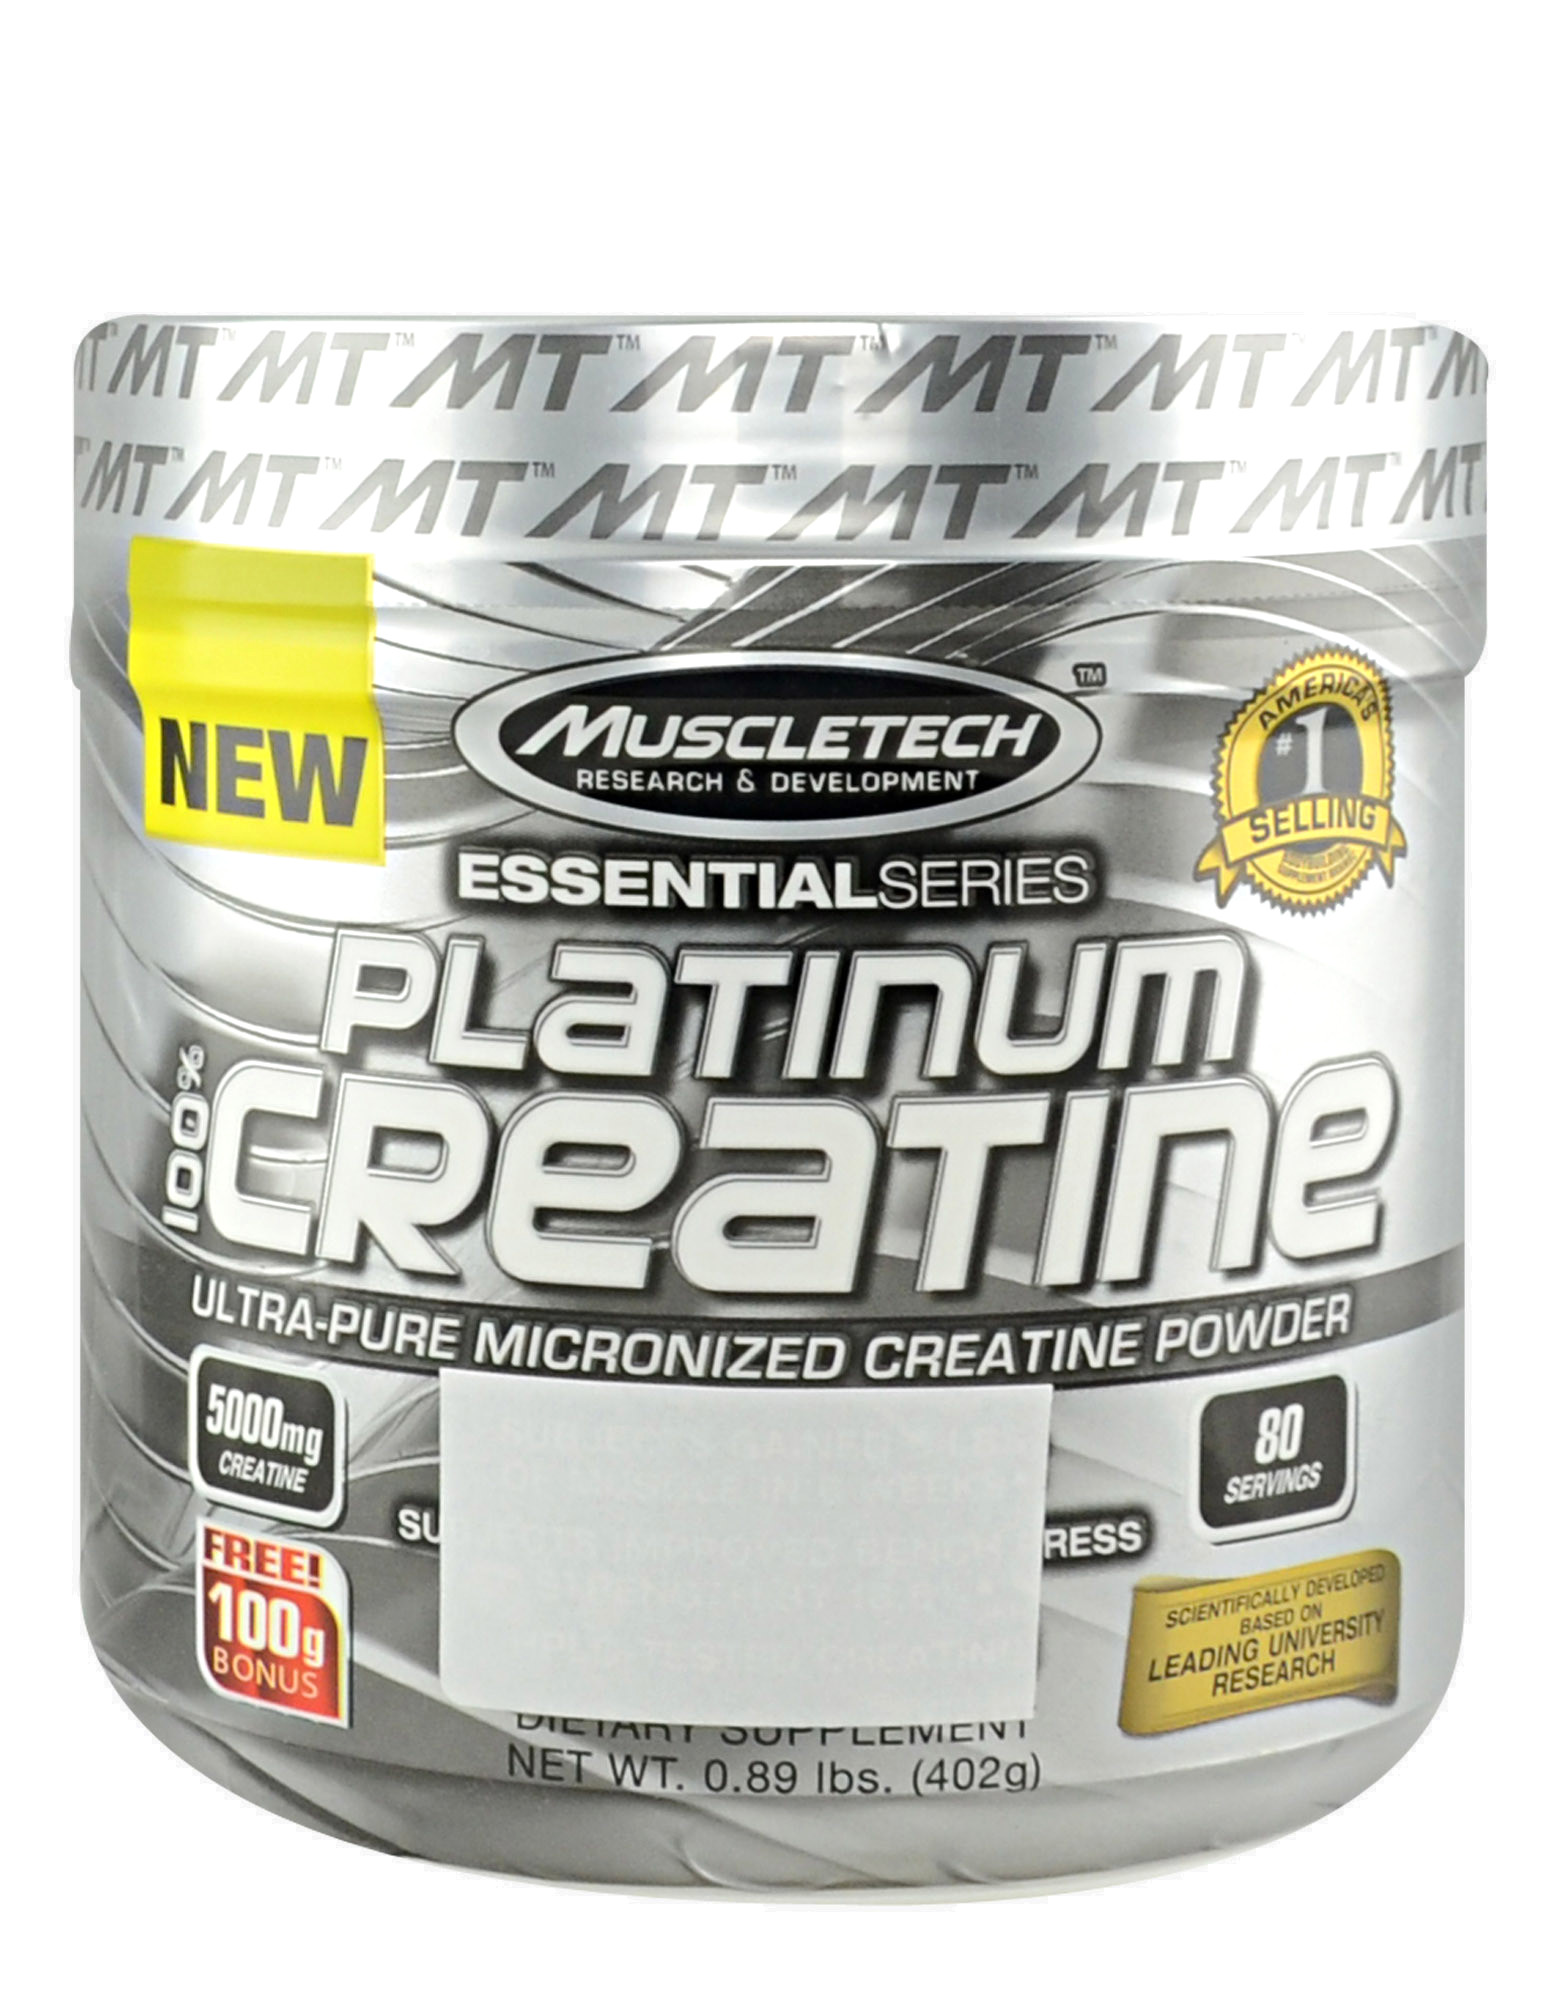 Muscletech creatine reviews